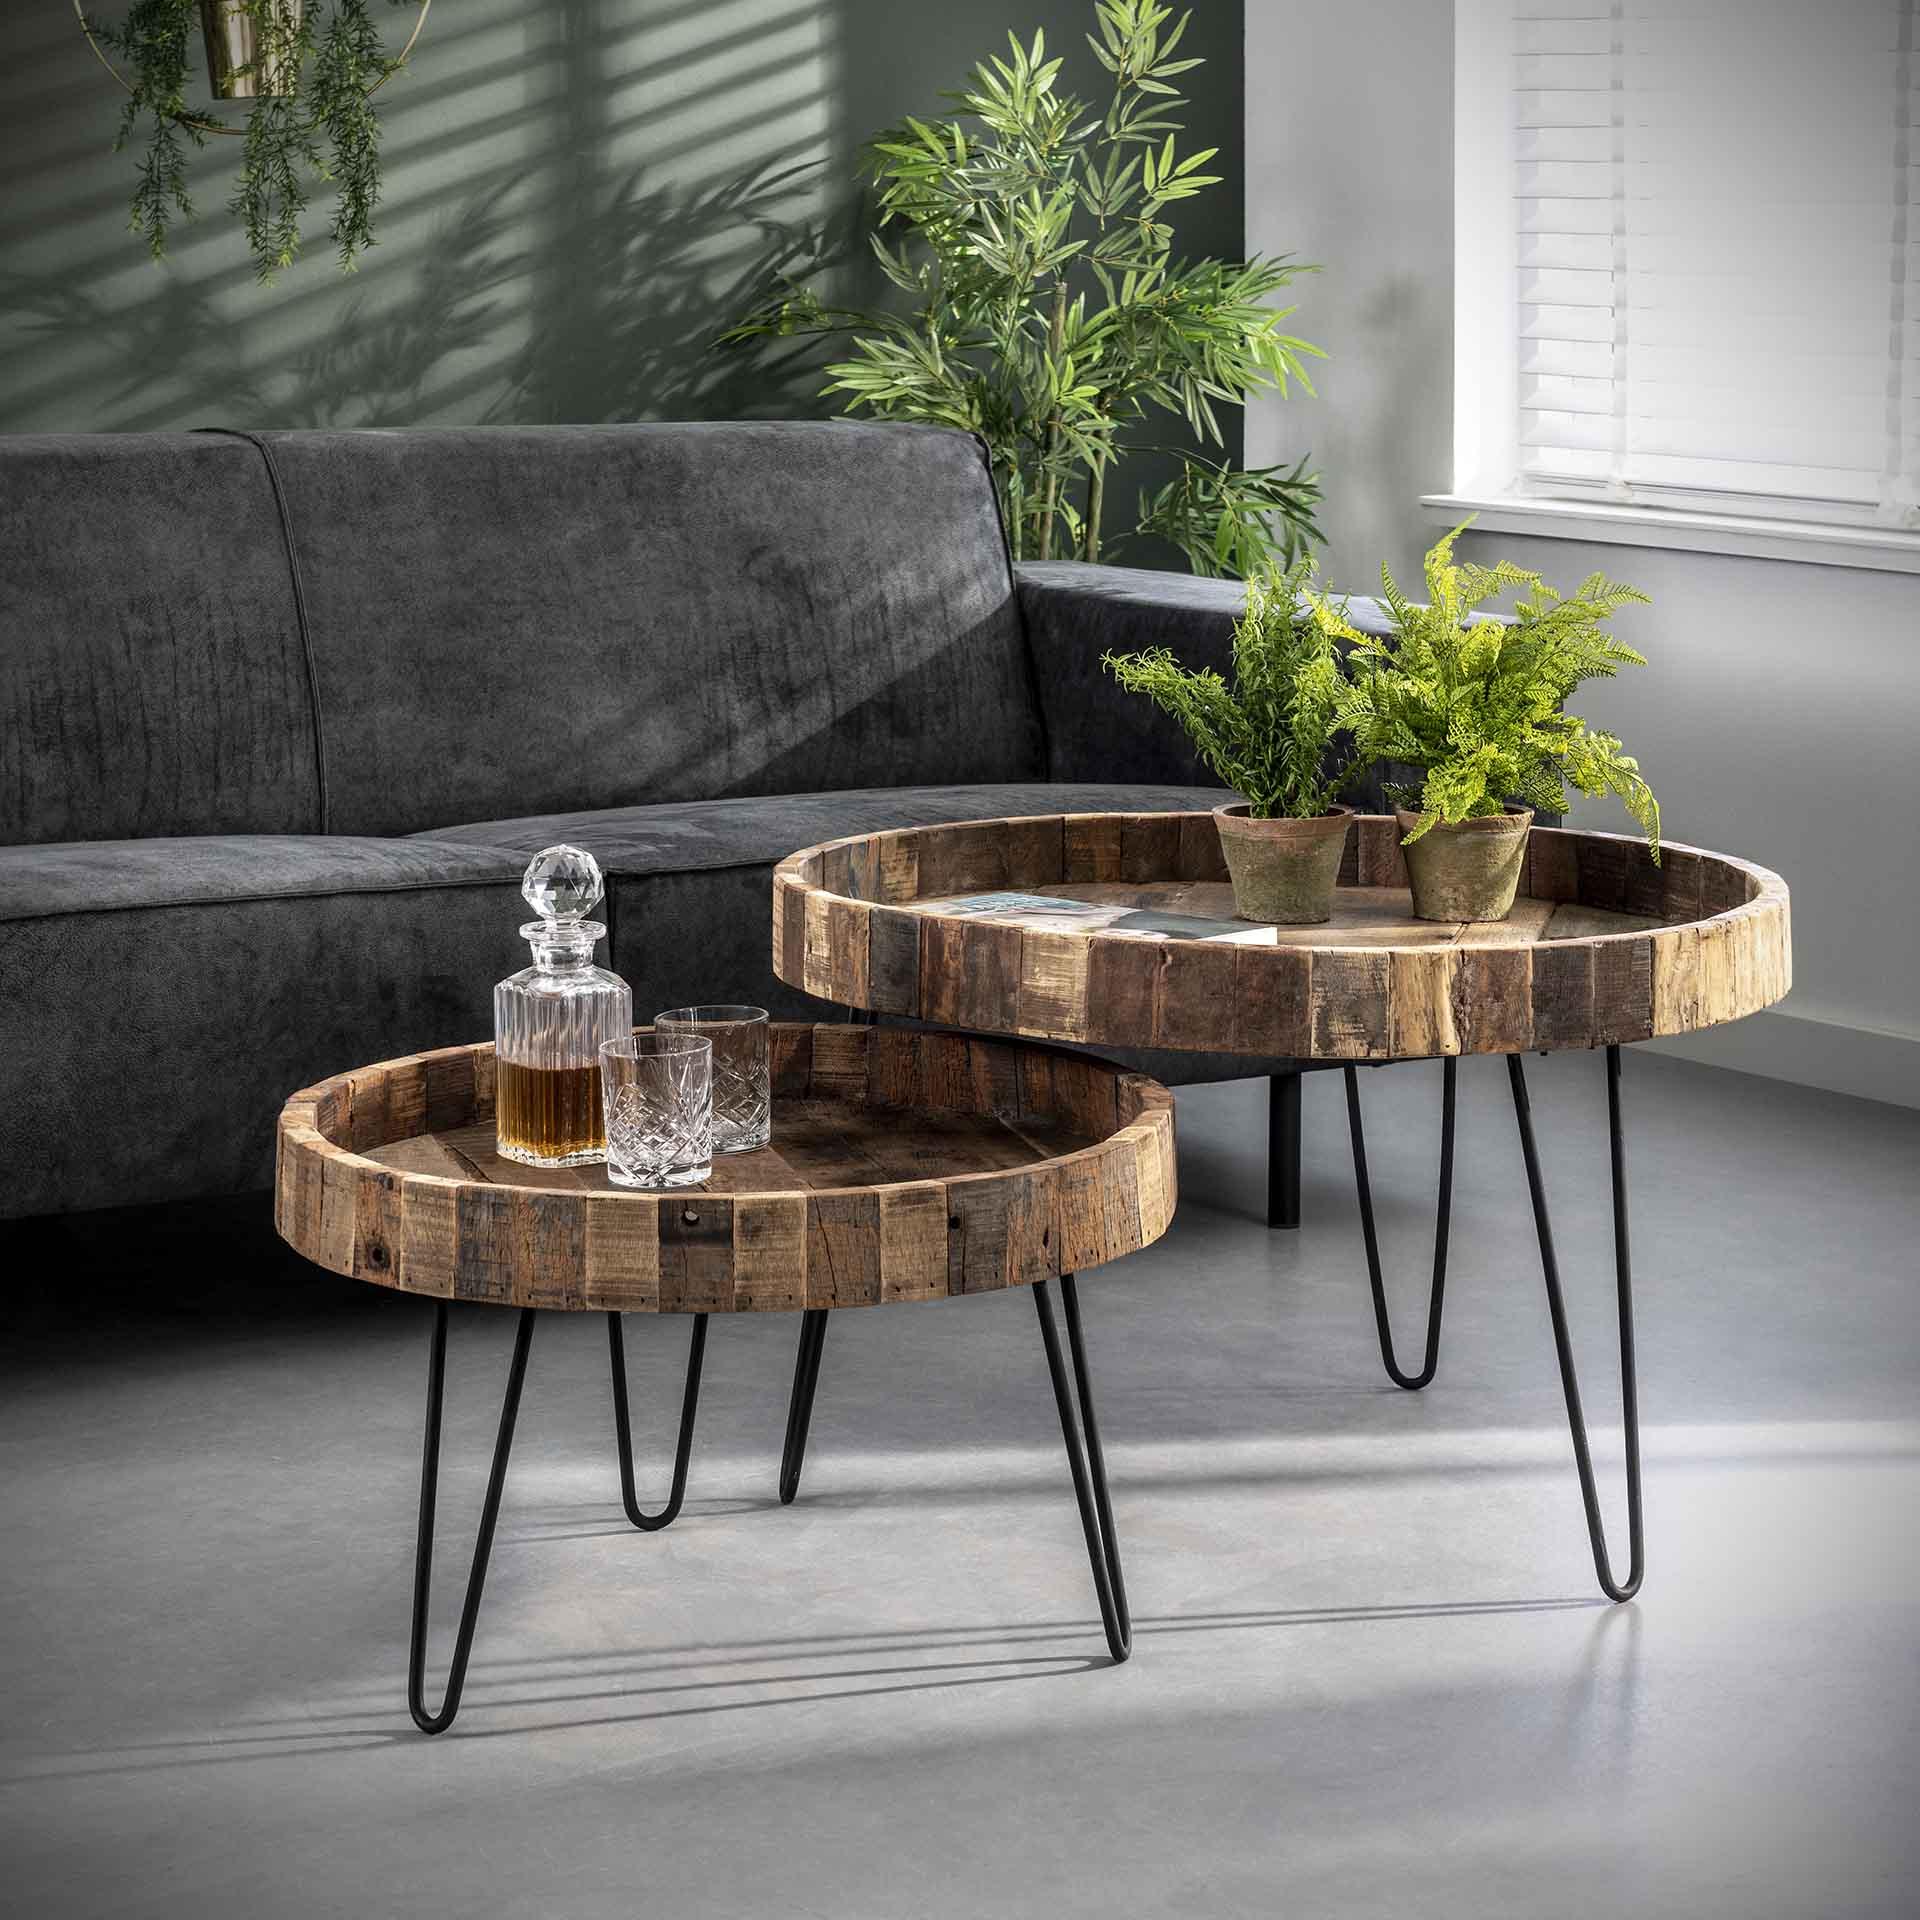 Couchtisch - Lounge - aus recyceltem Holz - 2-Teilig